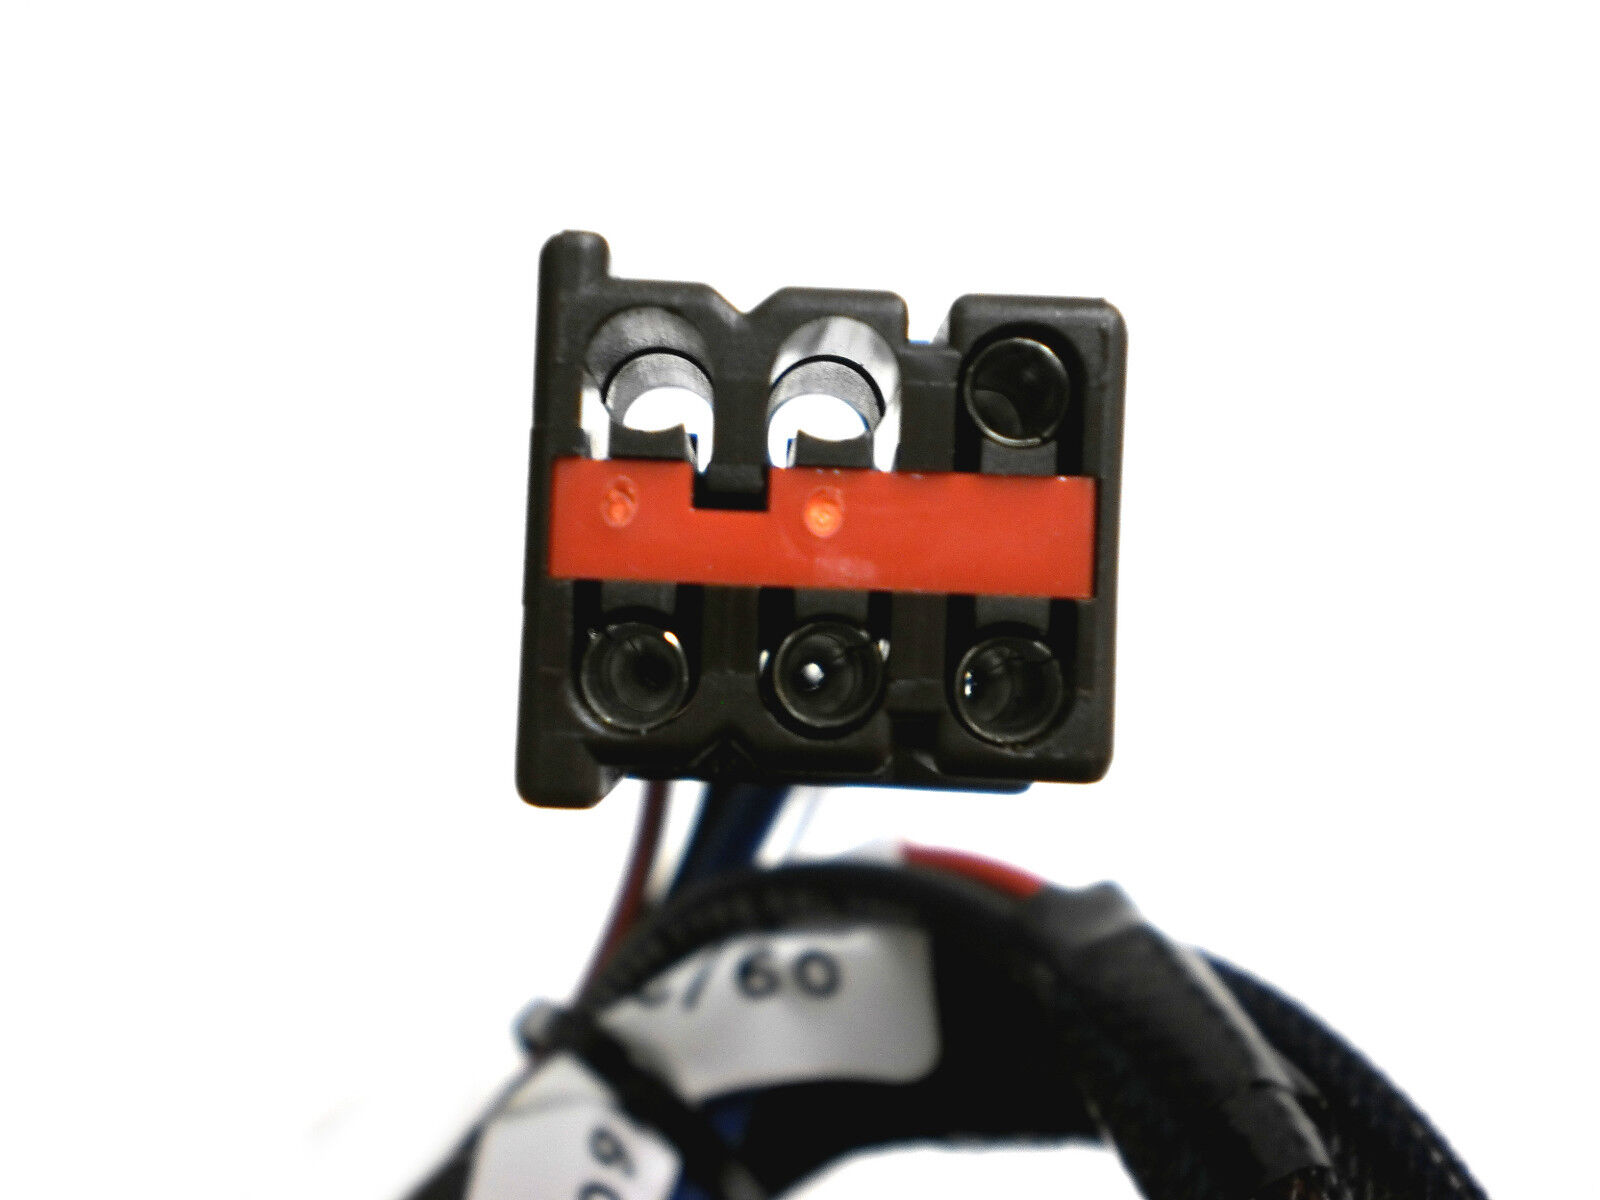 Wiring Diagram For Impulse Brake Controller : Electric ke controller diagram get free image